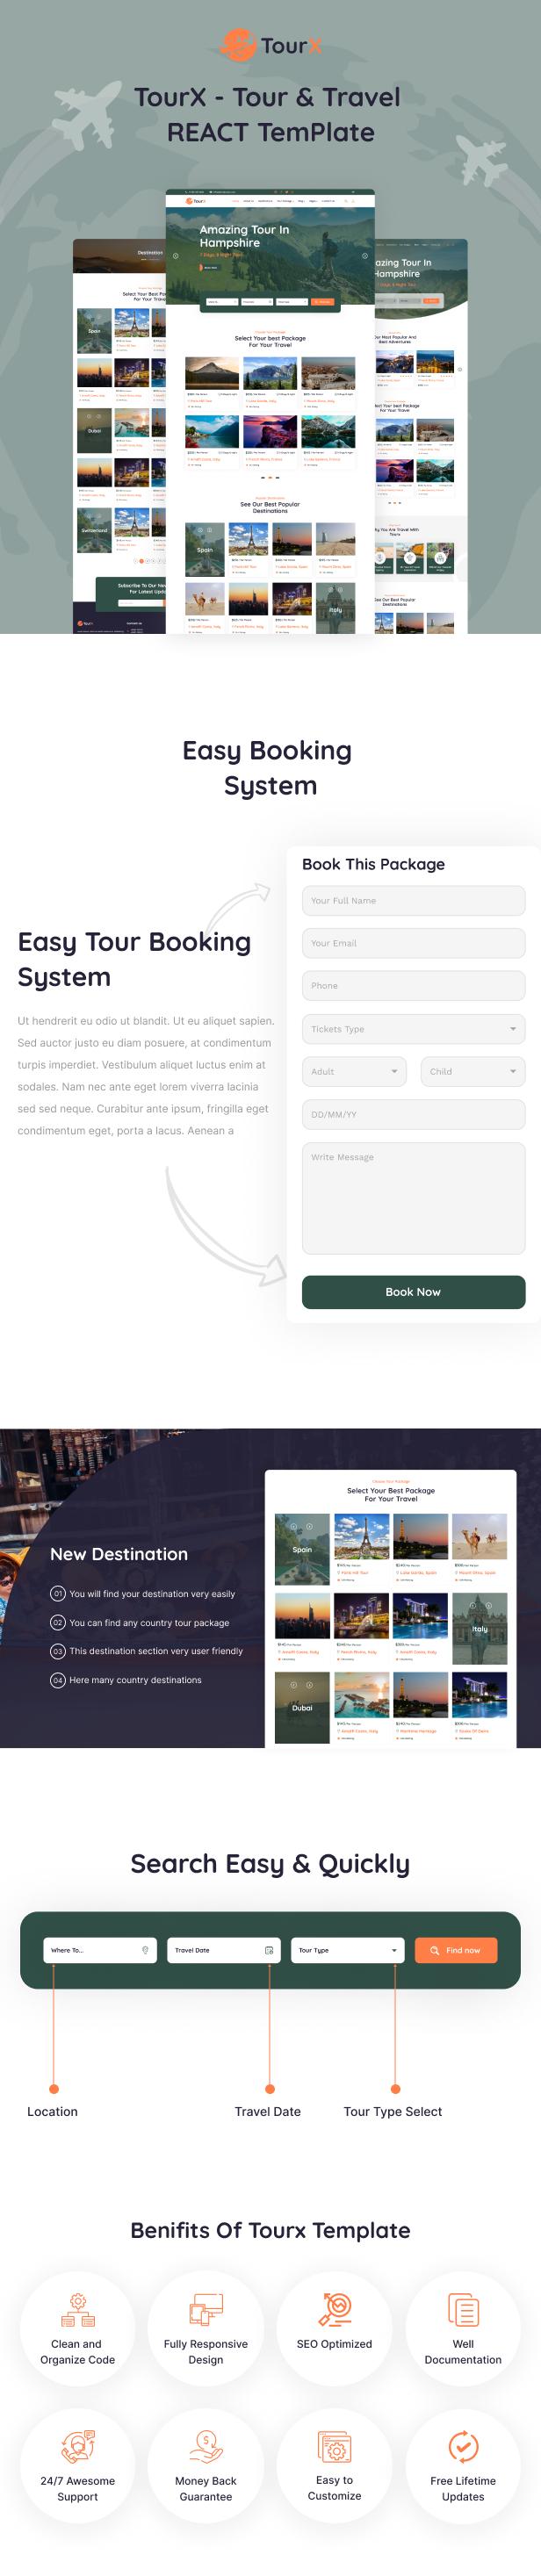 Travels Tourism React Templates